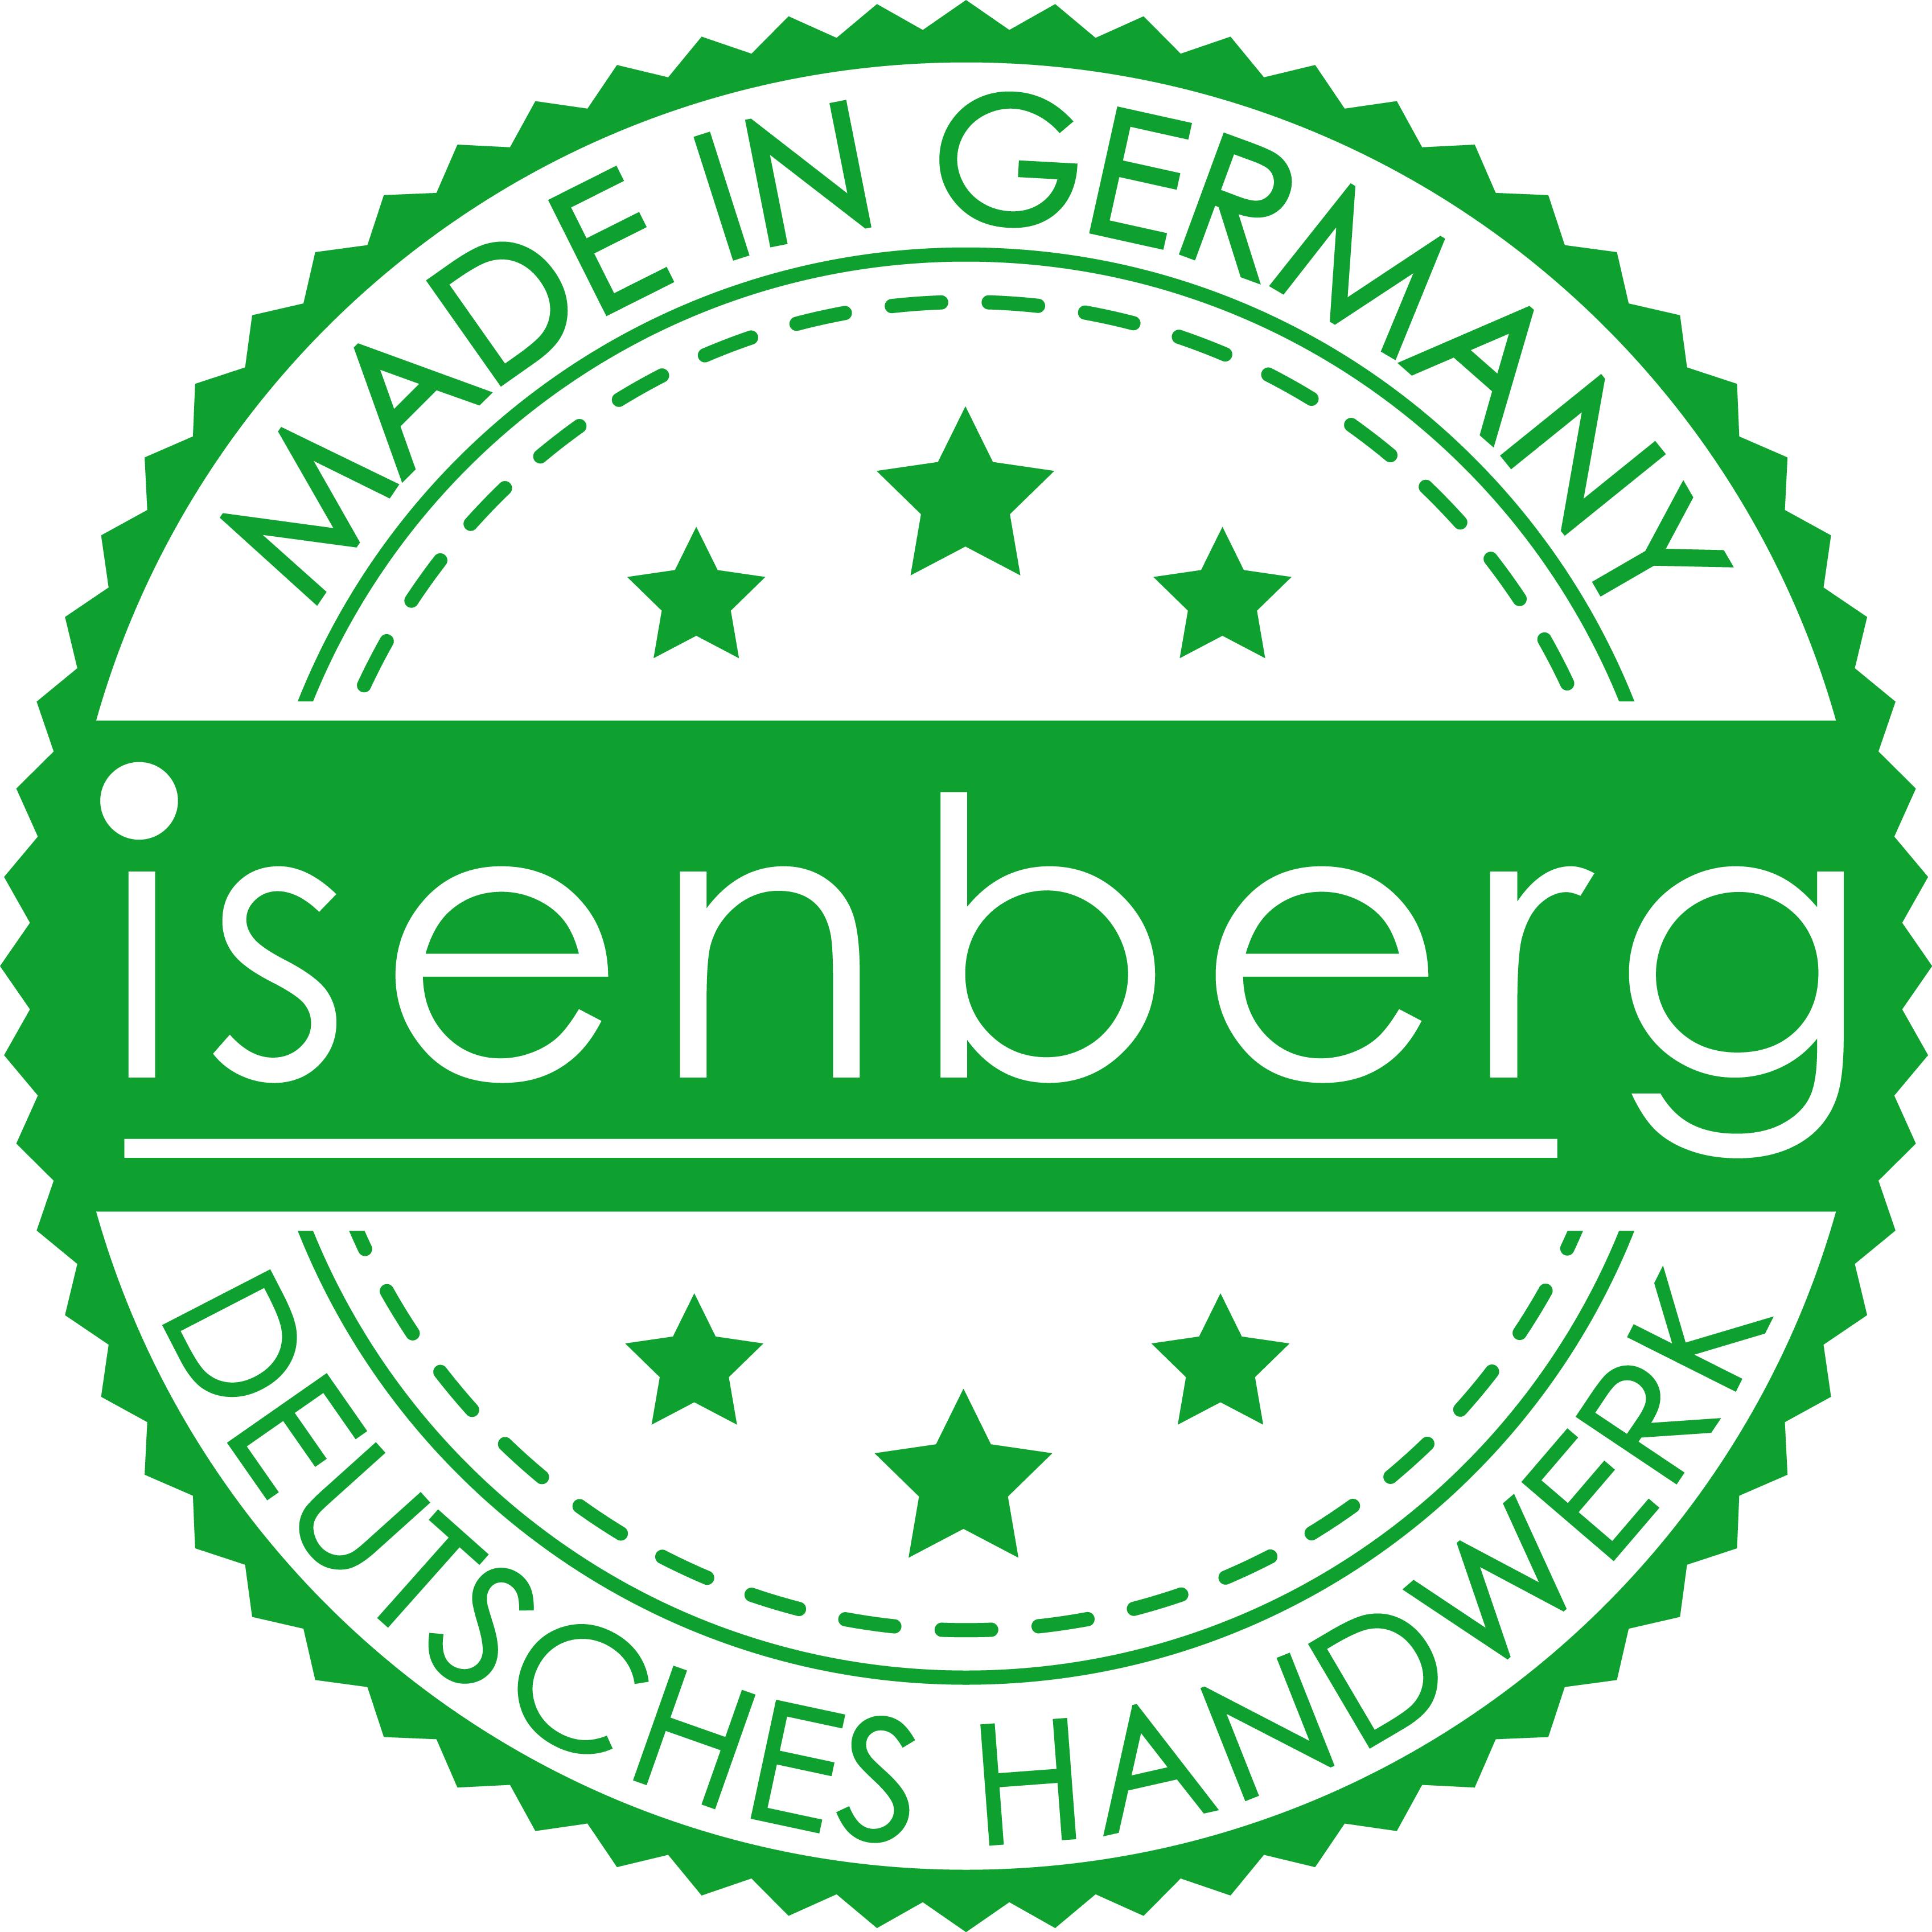 isenberg Made in Germany